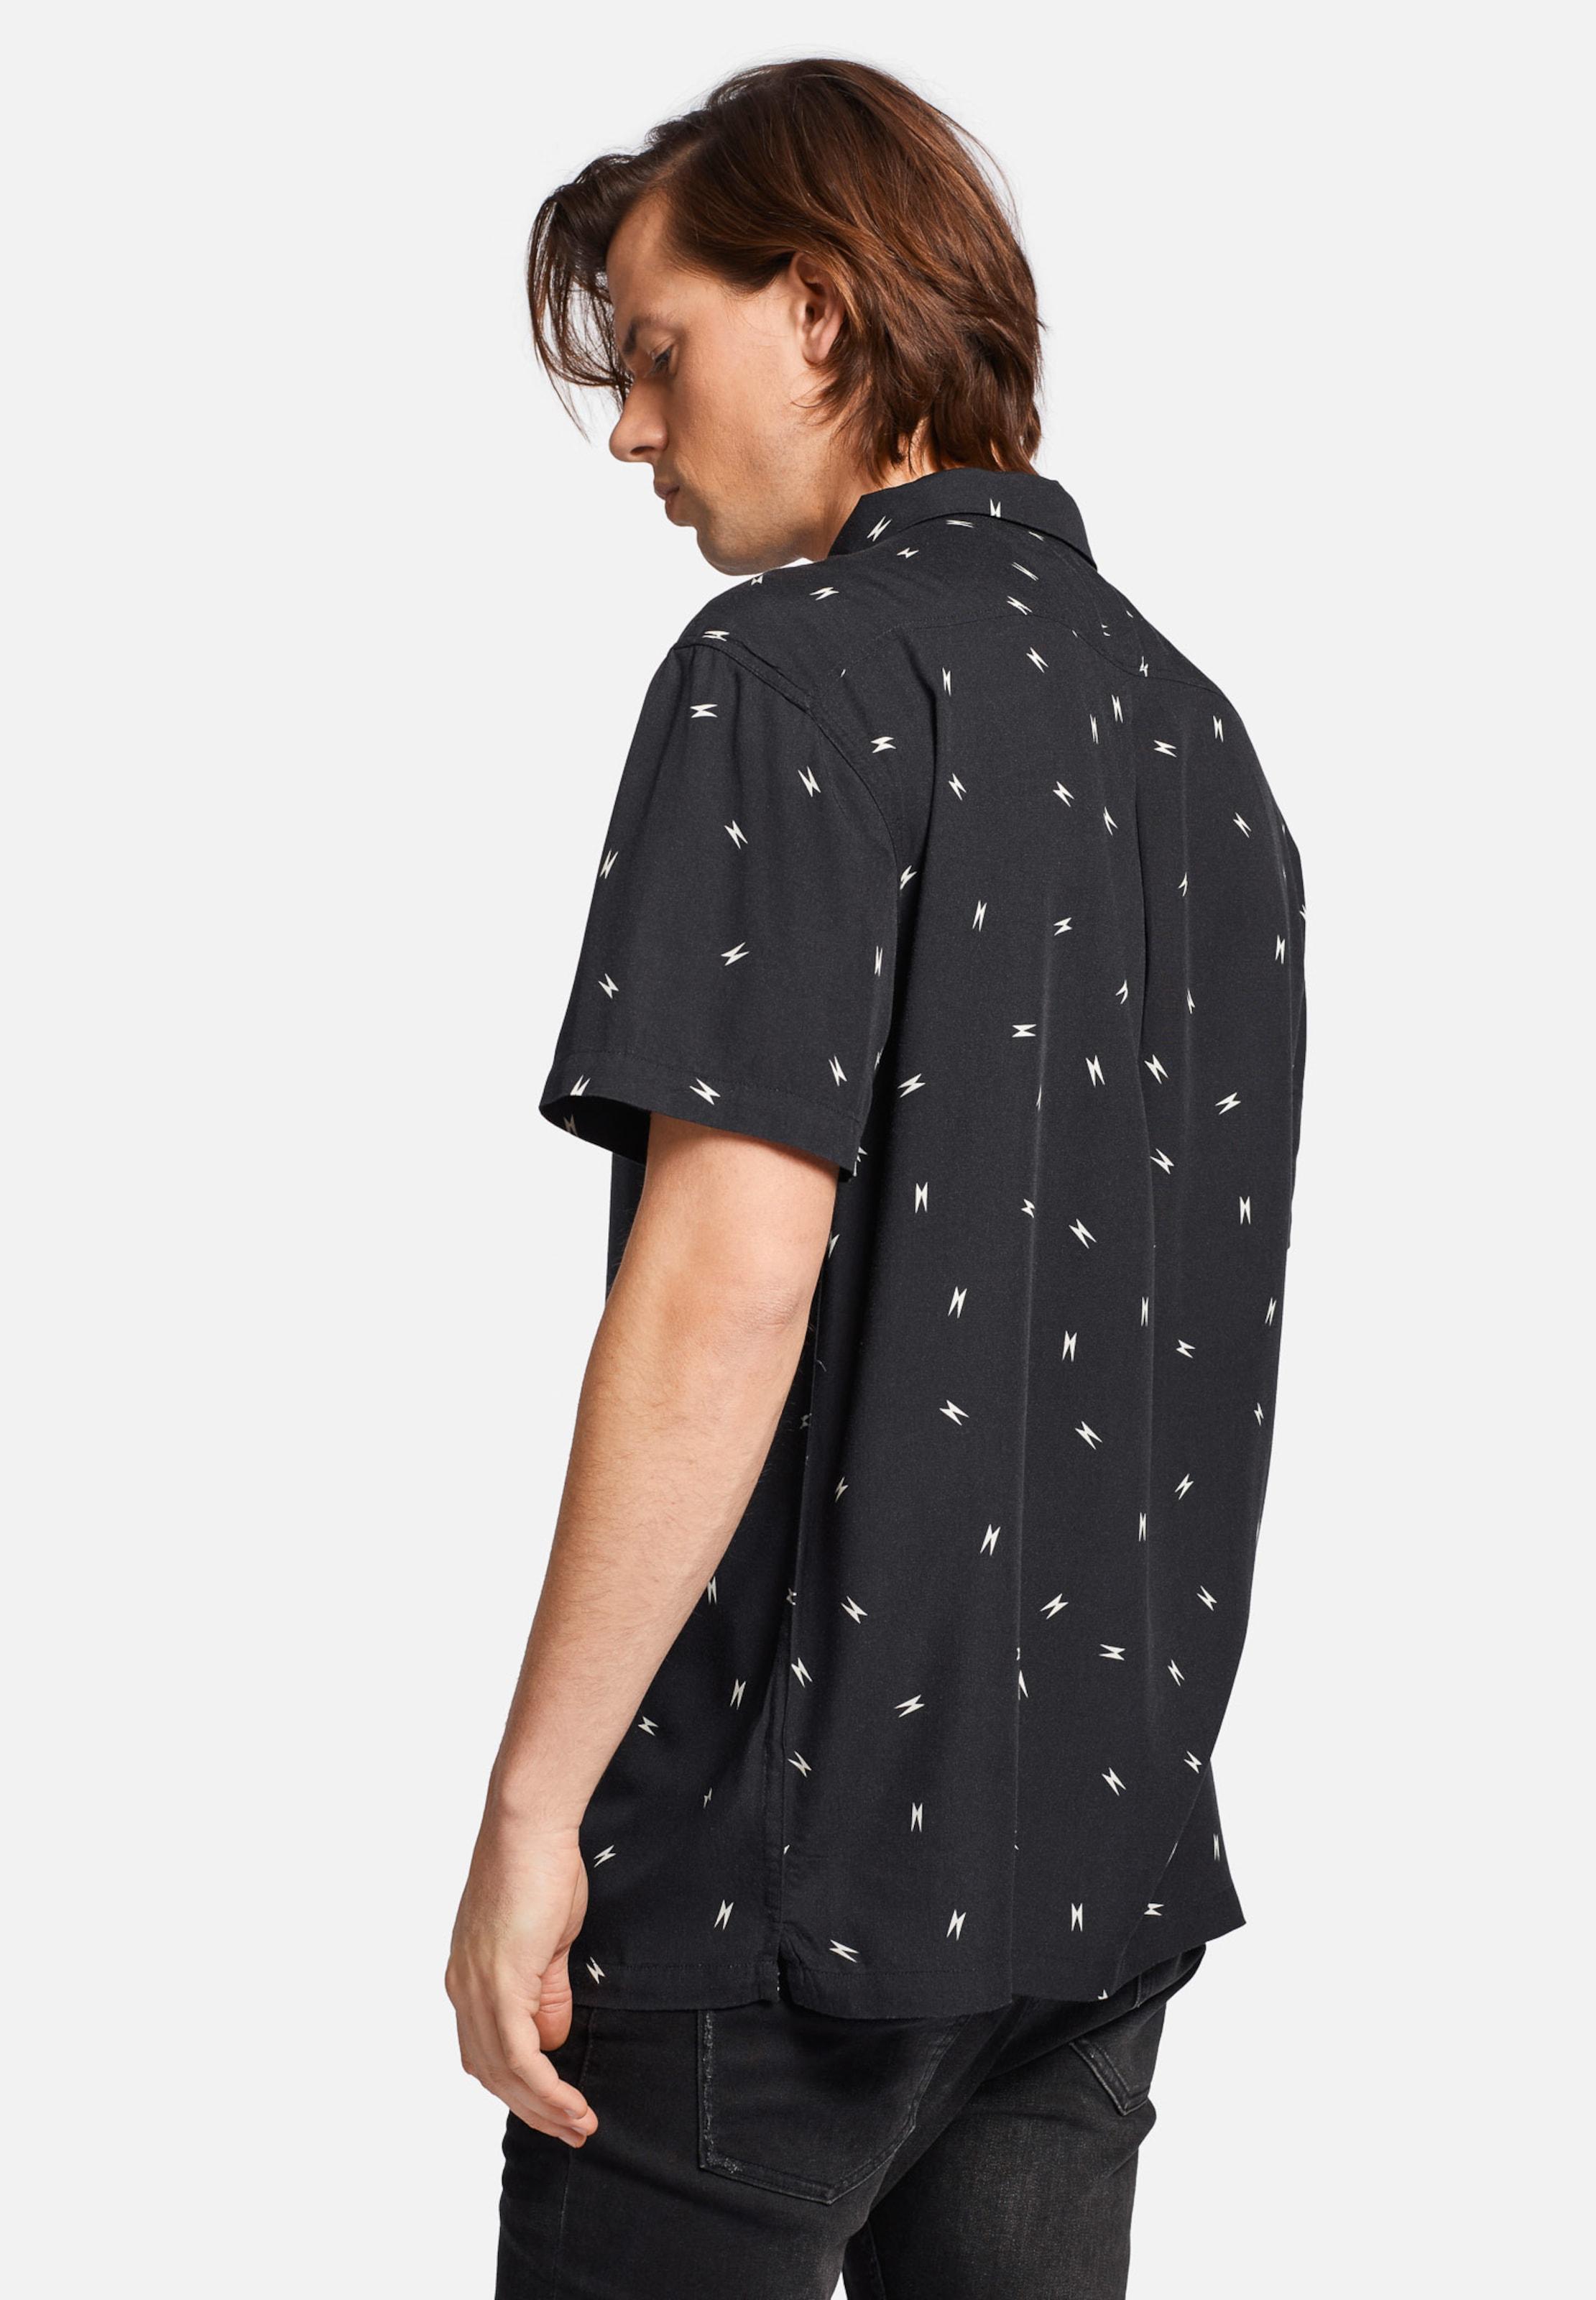 'daniele' In Overhemd Overhemd Khujo Khujo Khujo 'daniele' Overhemd In ZwartWit 'daniele' ZwartWit 5A4Rj3Lq